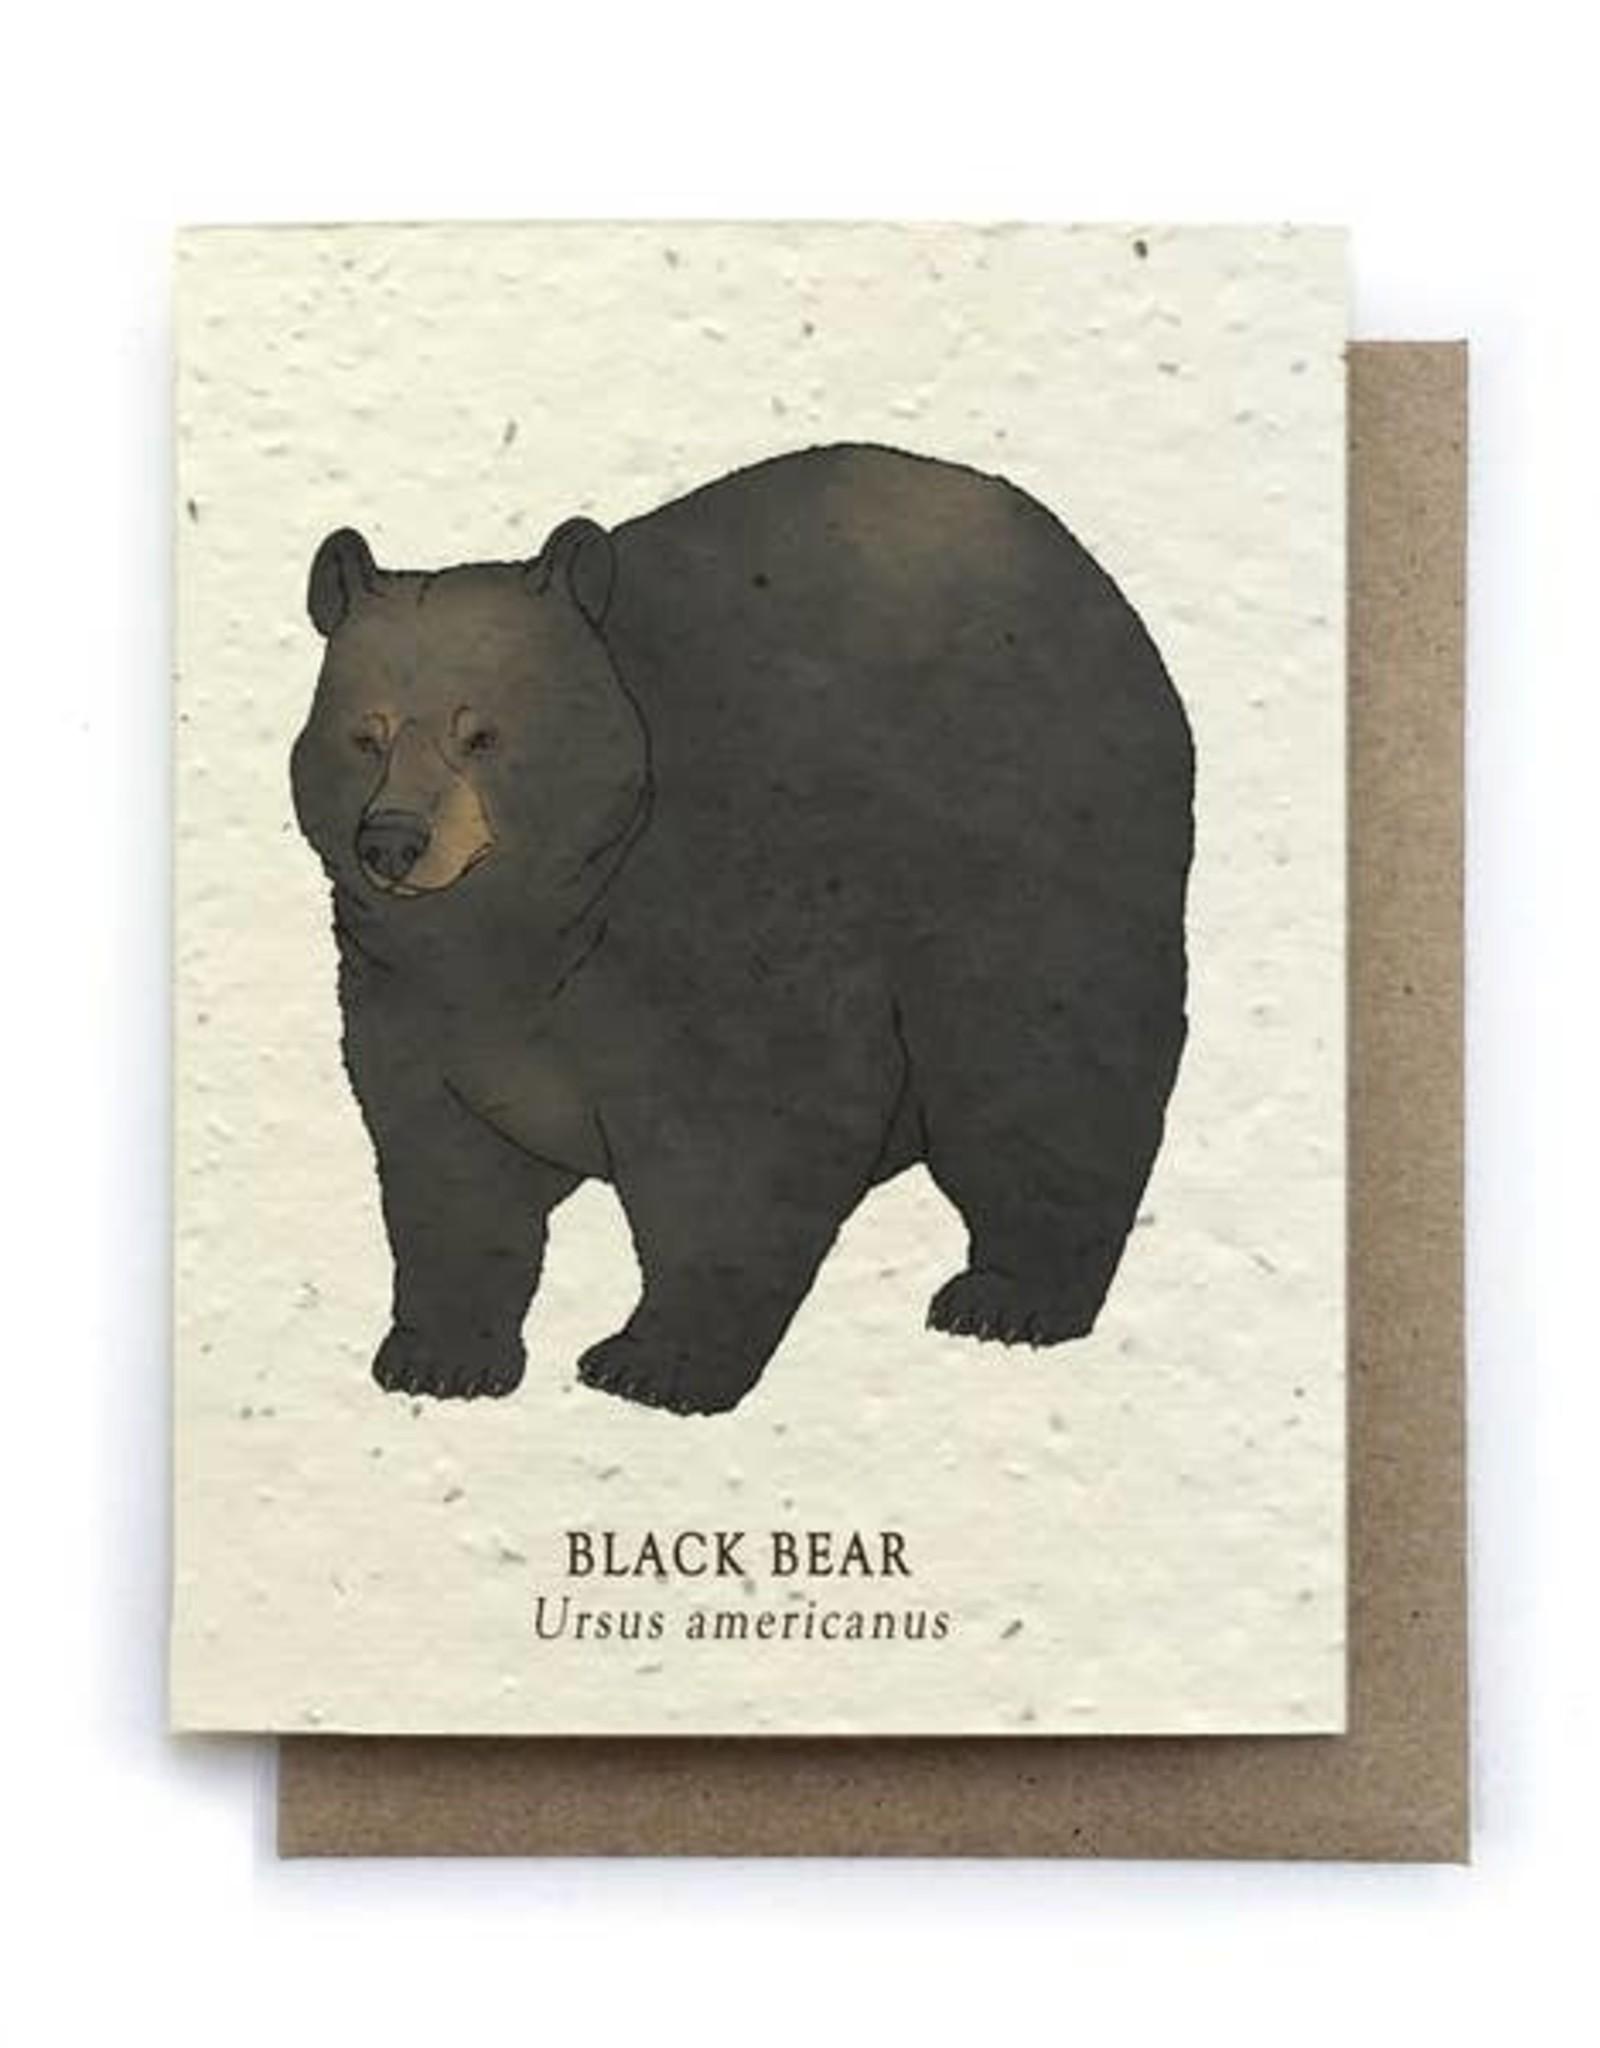 LeBLANC finds Black Bear Animal Greeting Cards - Plantable Seed Paper